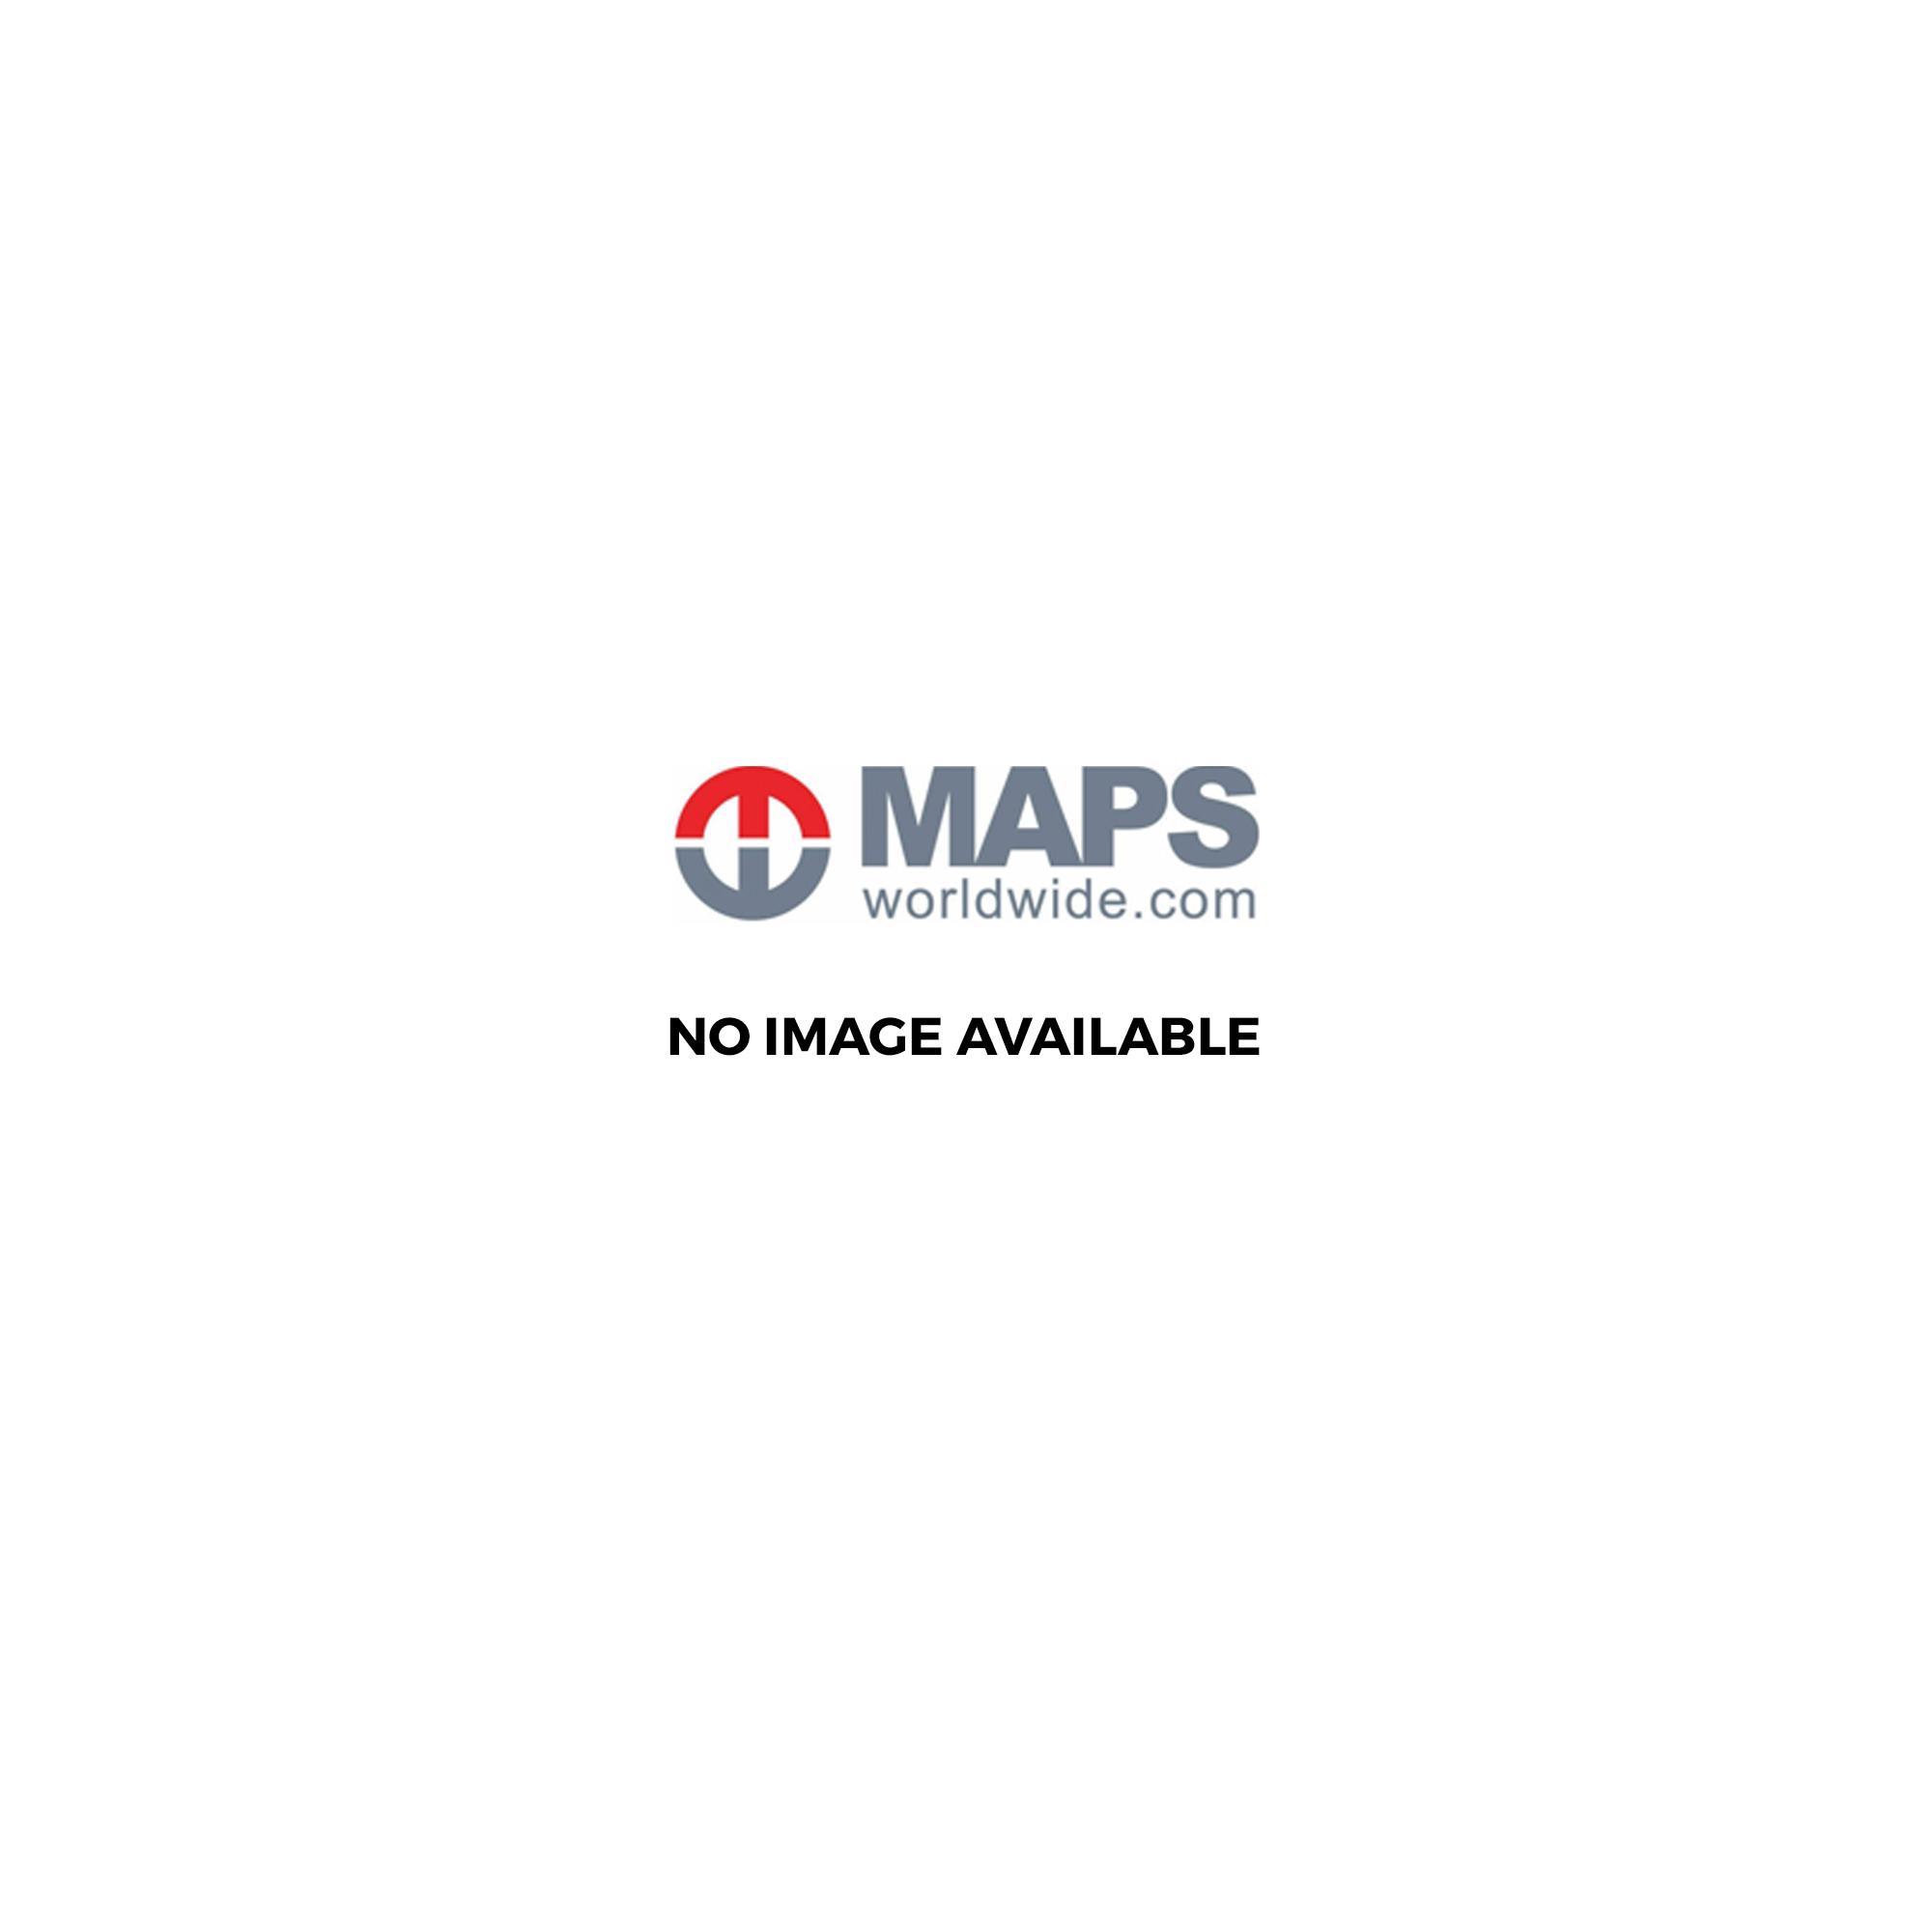 Evia Eyboia and Skyros Topo Touring Map 04 Europe from Maps